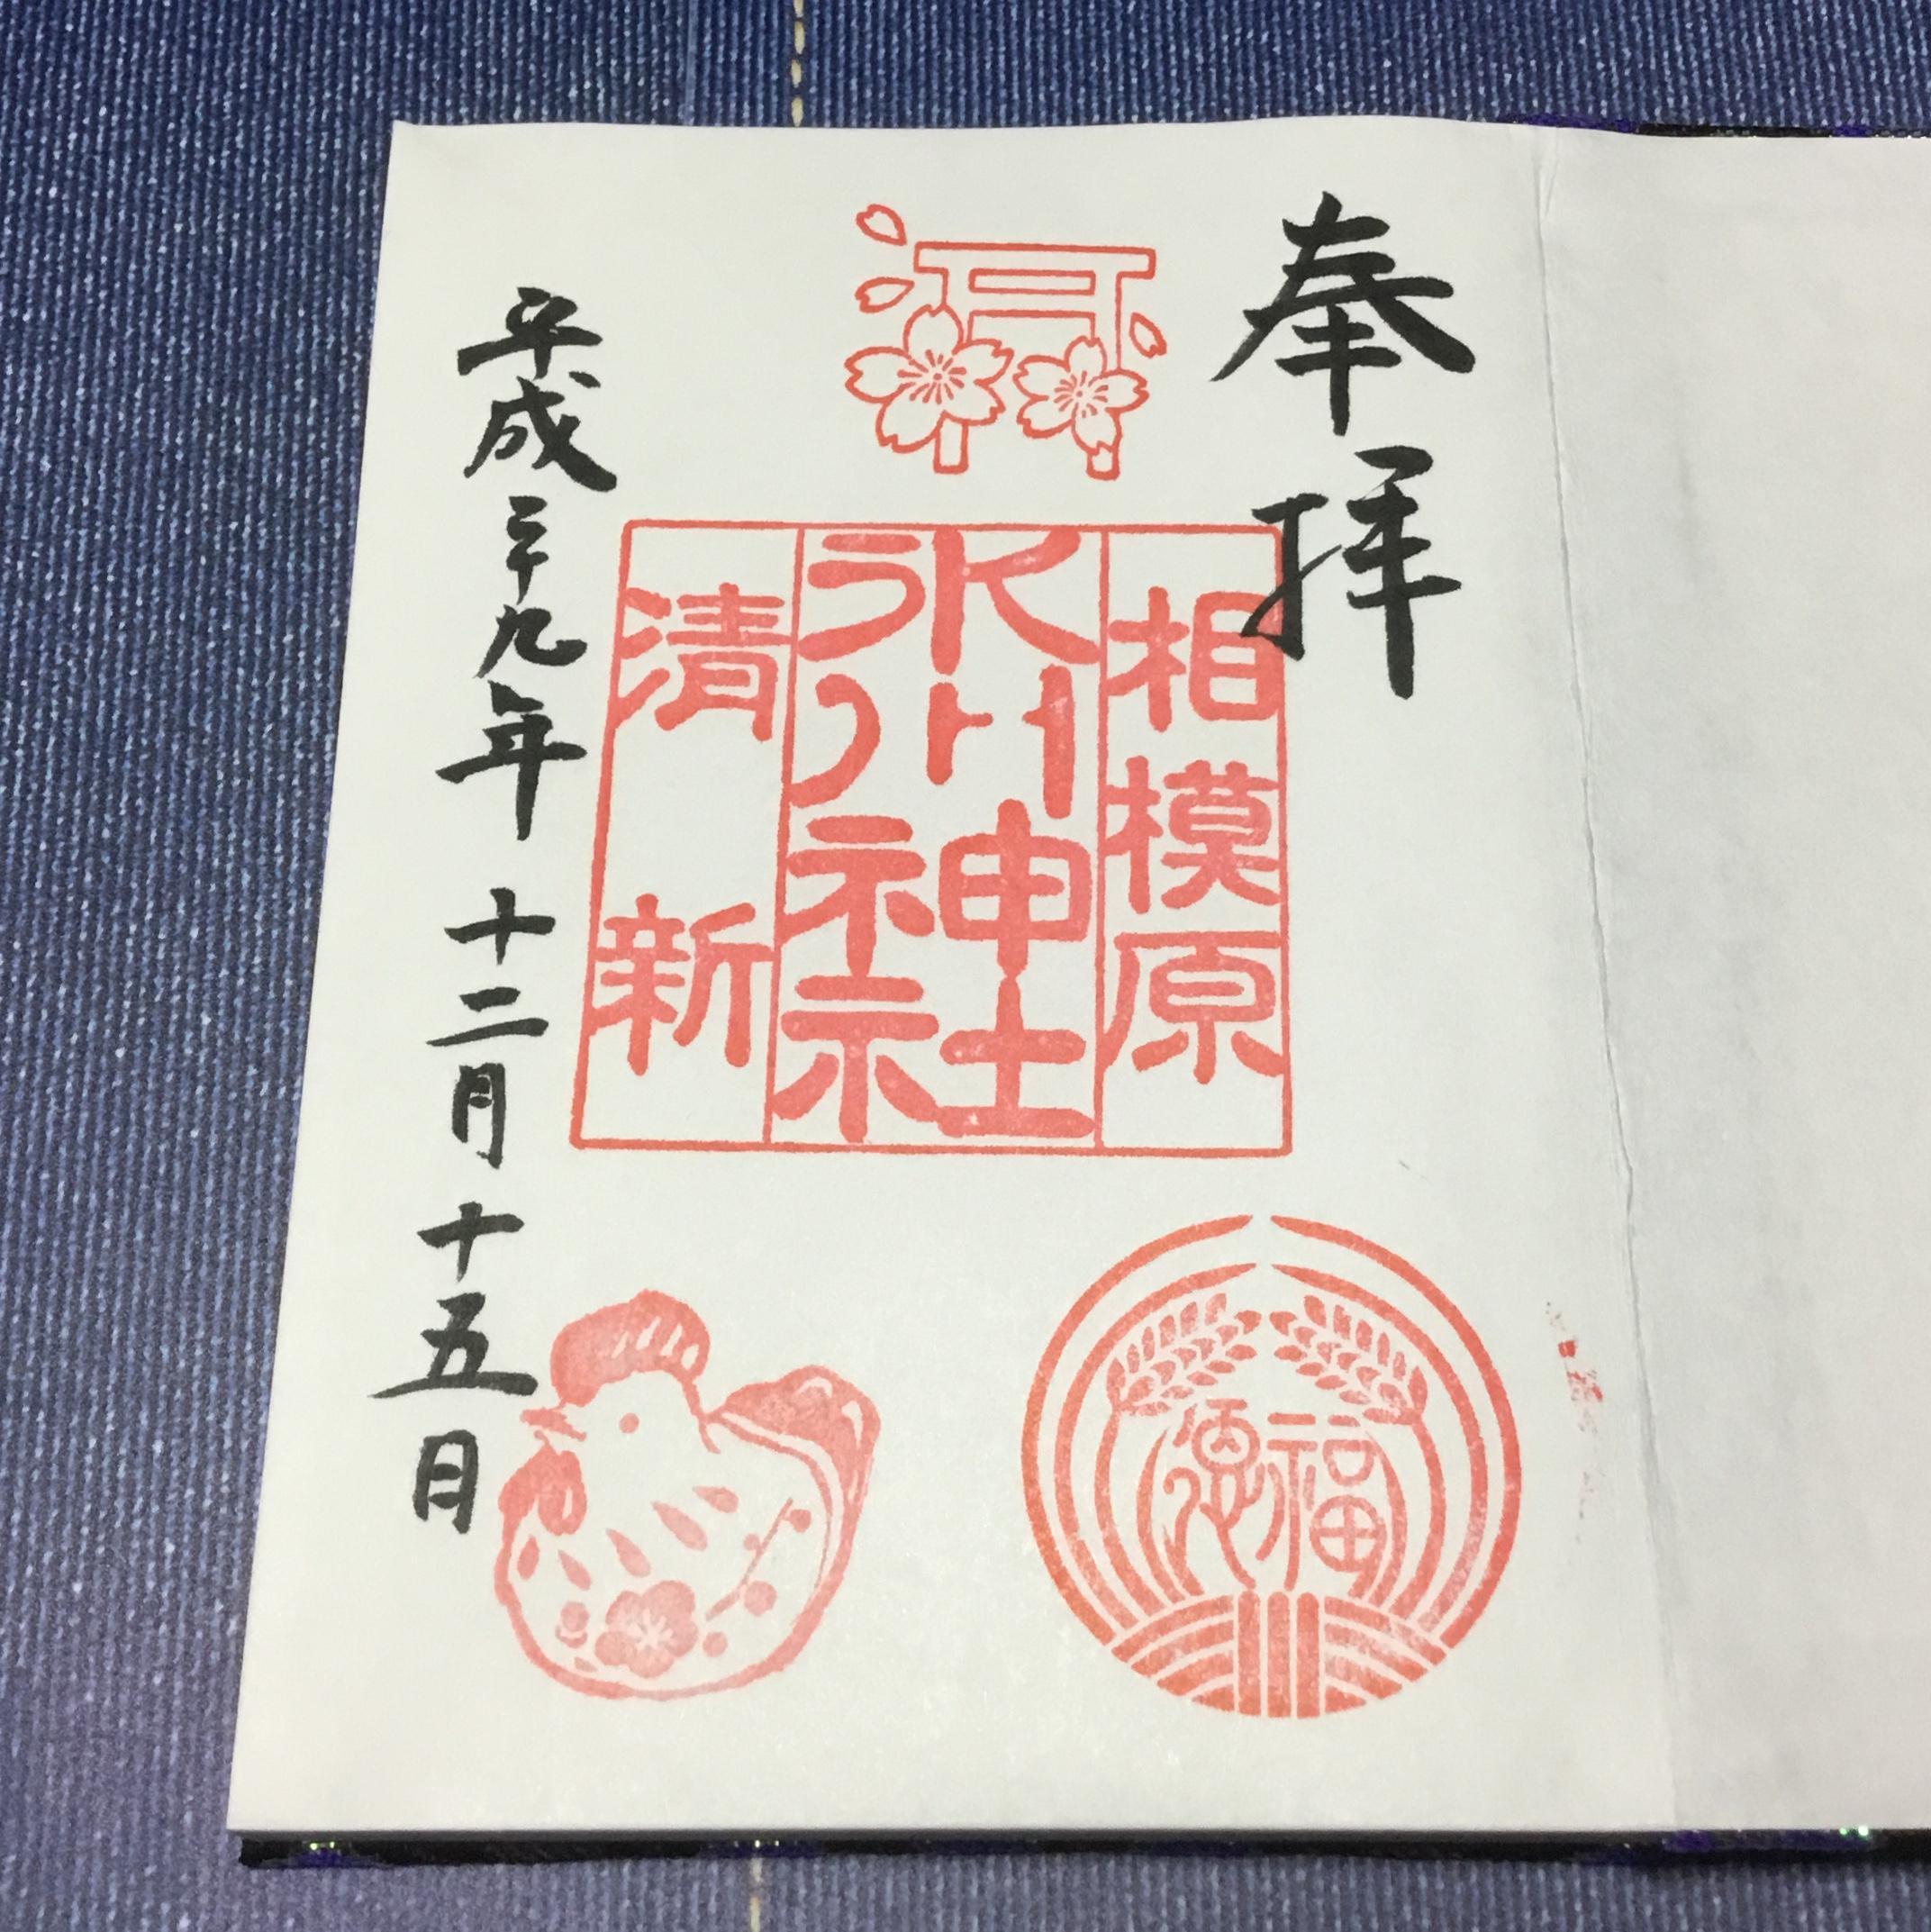 相模原氷川神社の御朱印